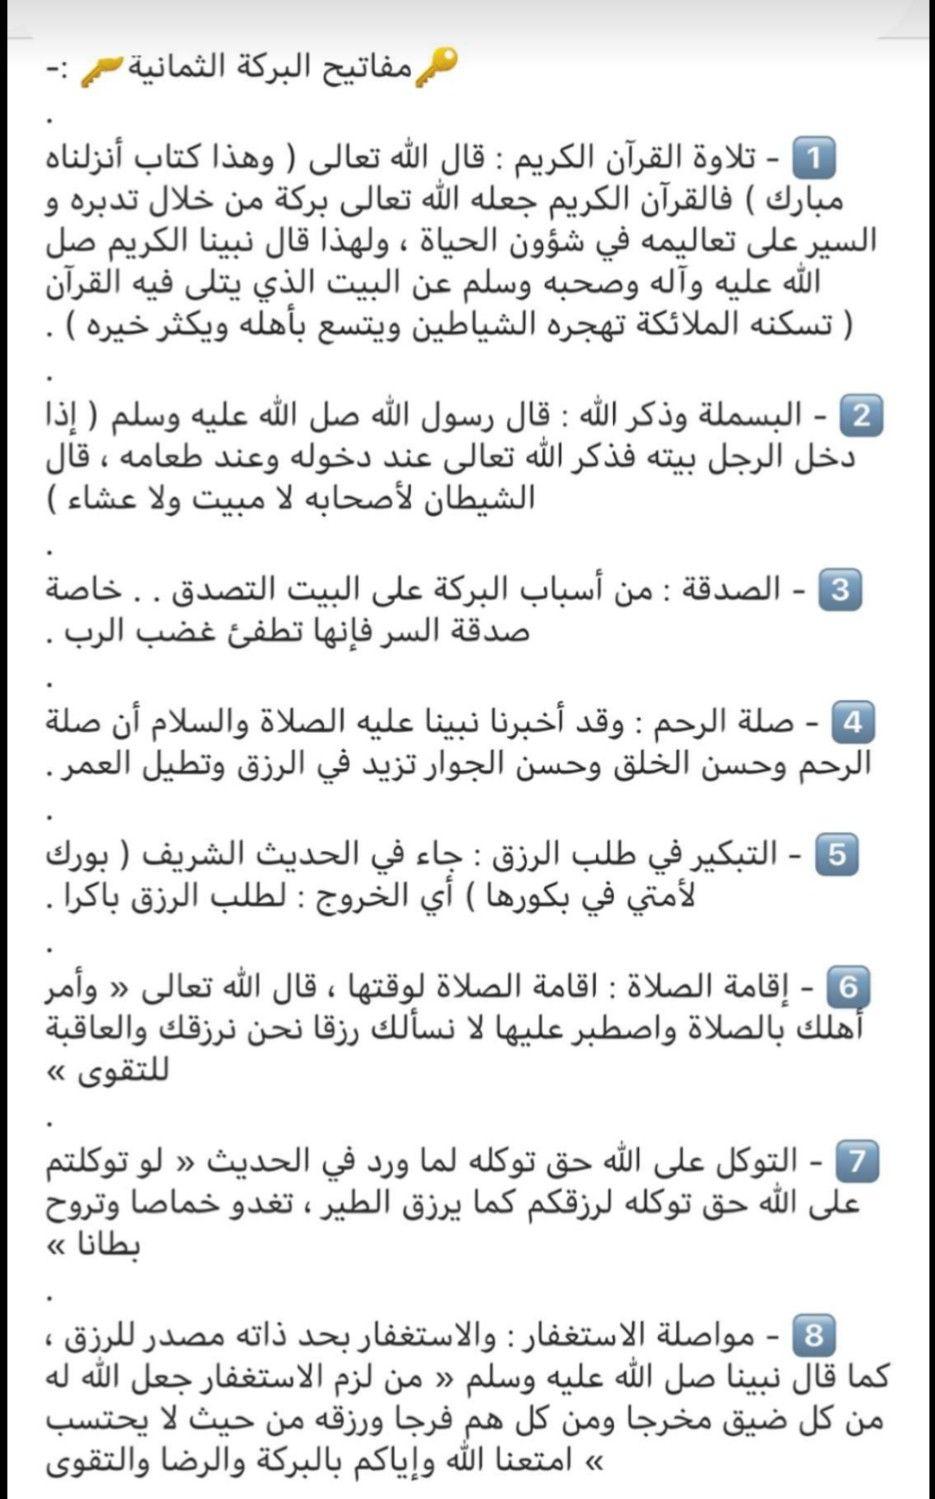 Pin By Zaaha 23 On ادعية Islamic Phrases Phrase Sog